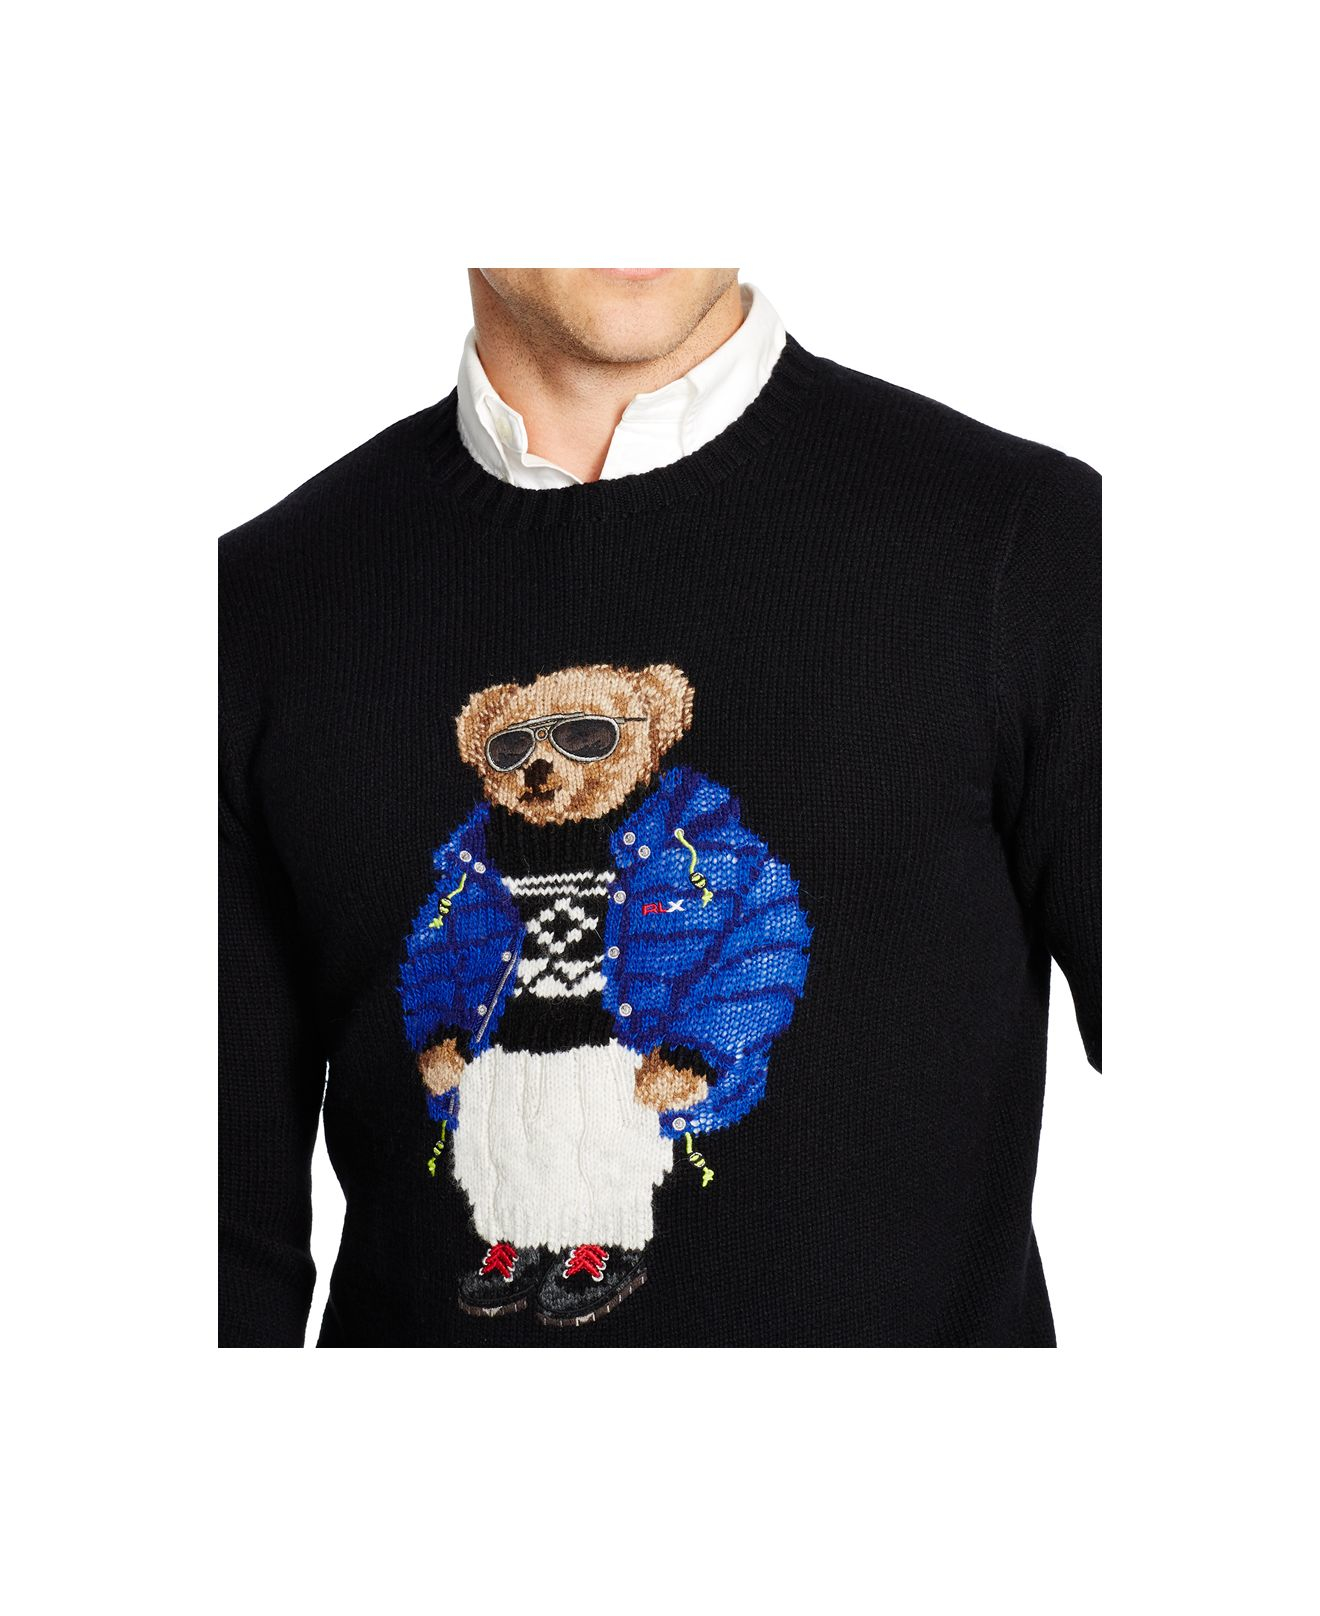 Blend Sweater Polo Black Bear Wool Men For Ralph Lauren LMqVSjGpUz